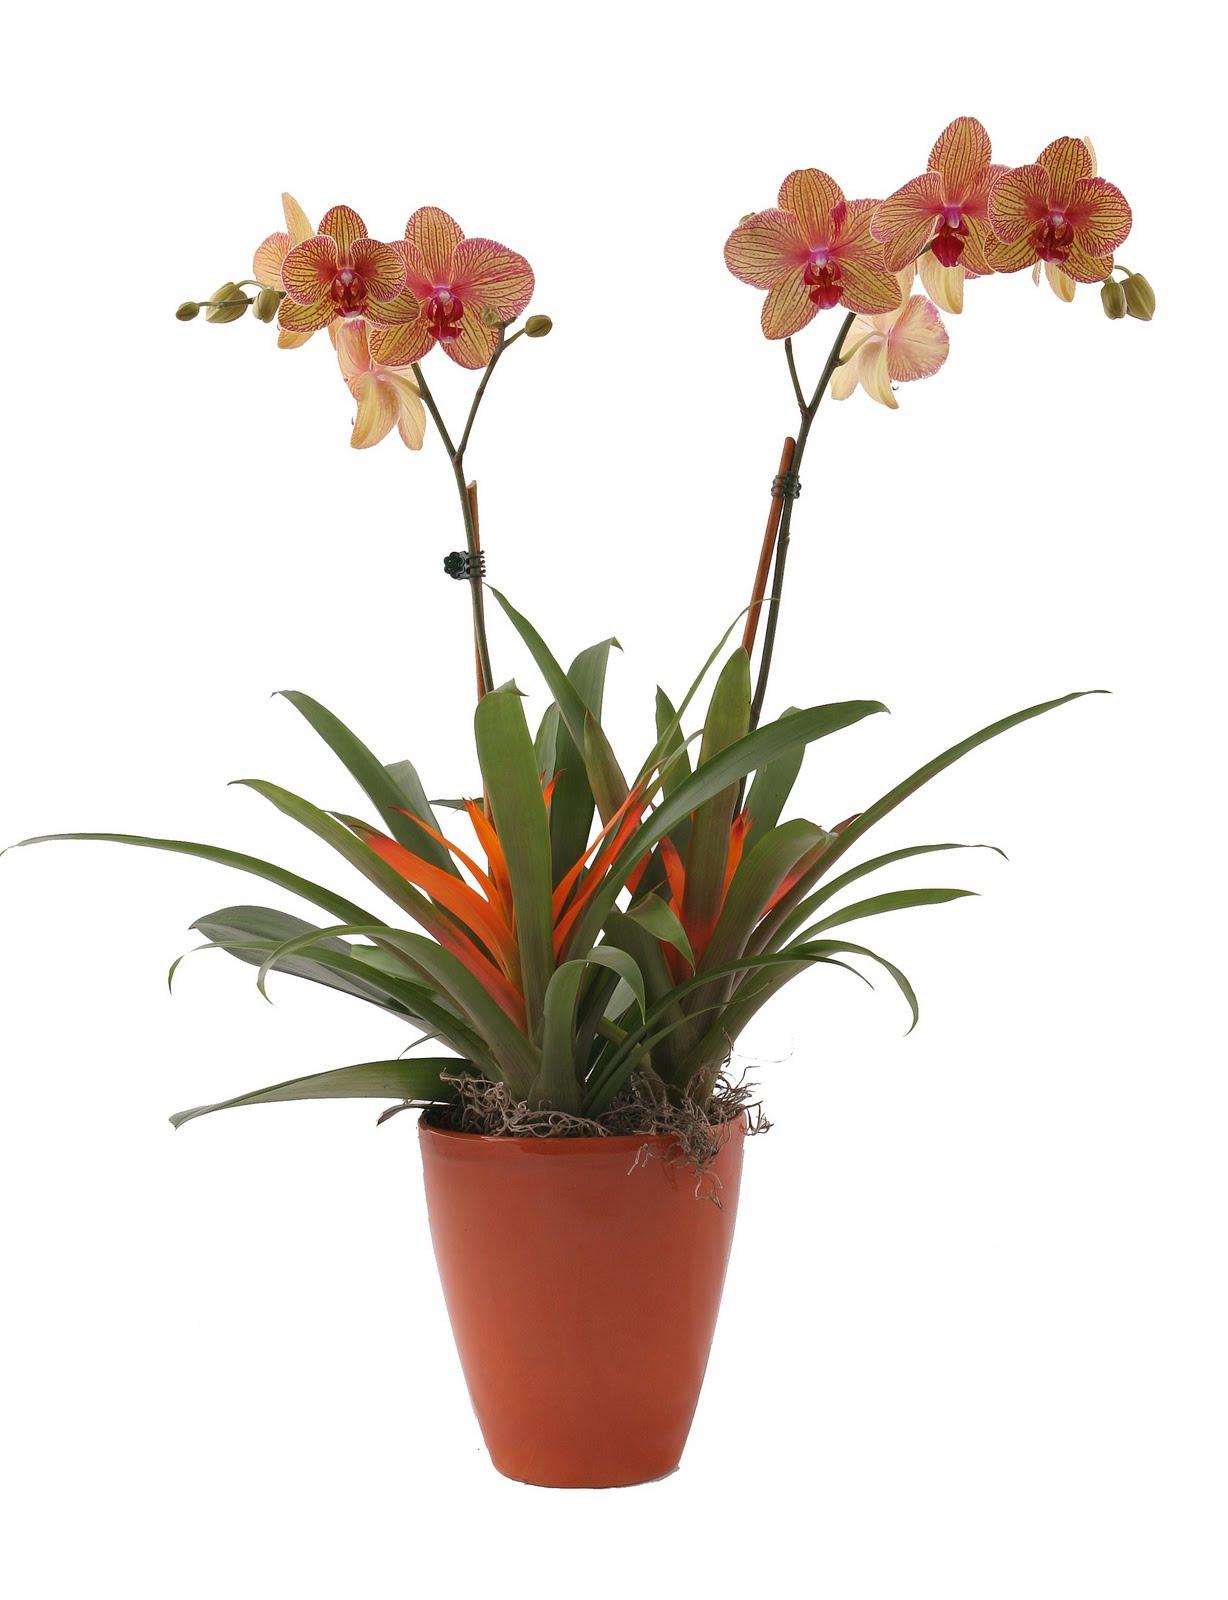 Garden Design Win Two Orchid And Bromeliad Arrangements